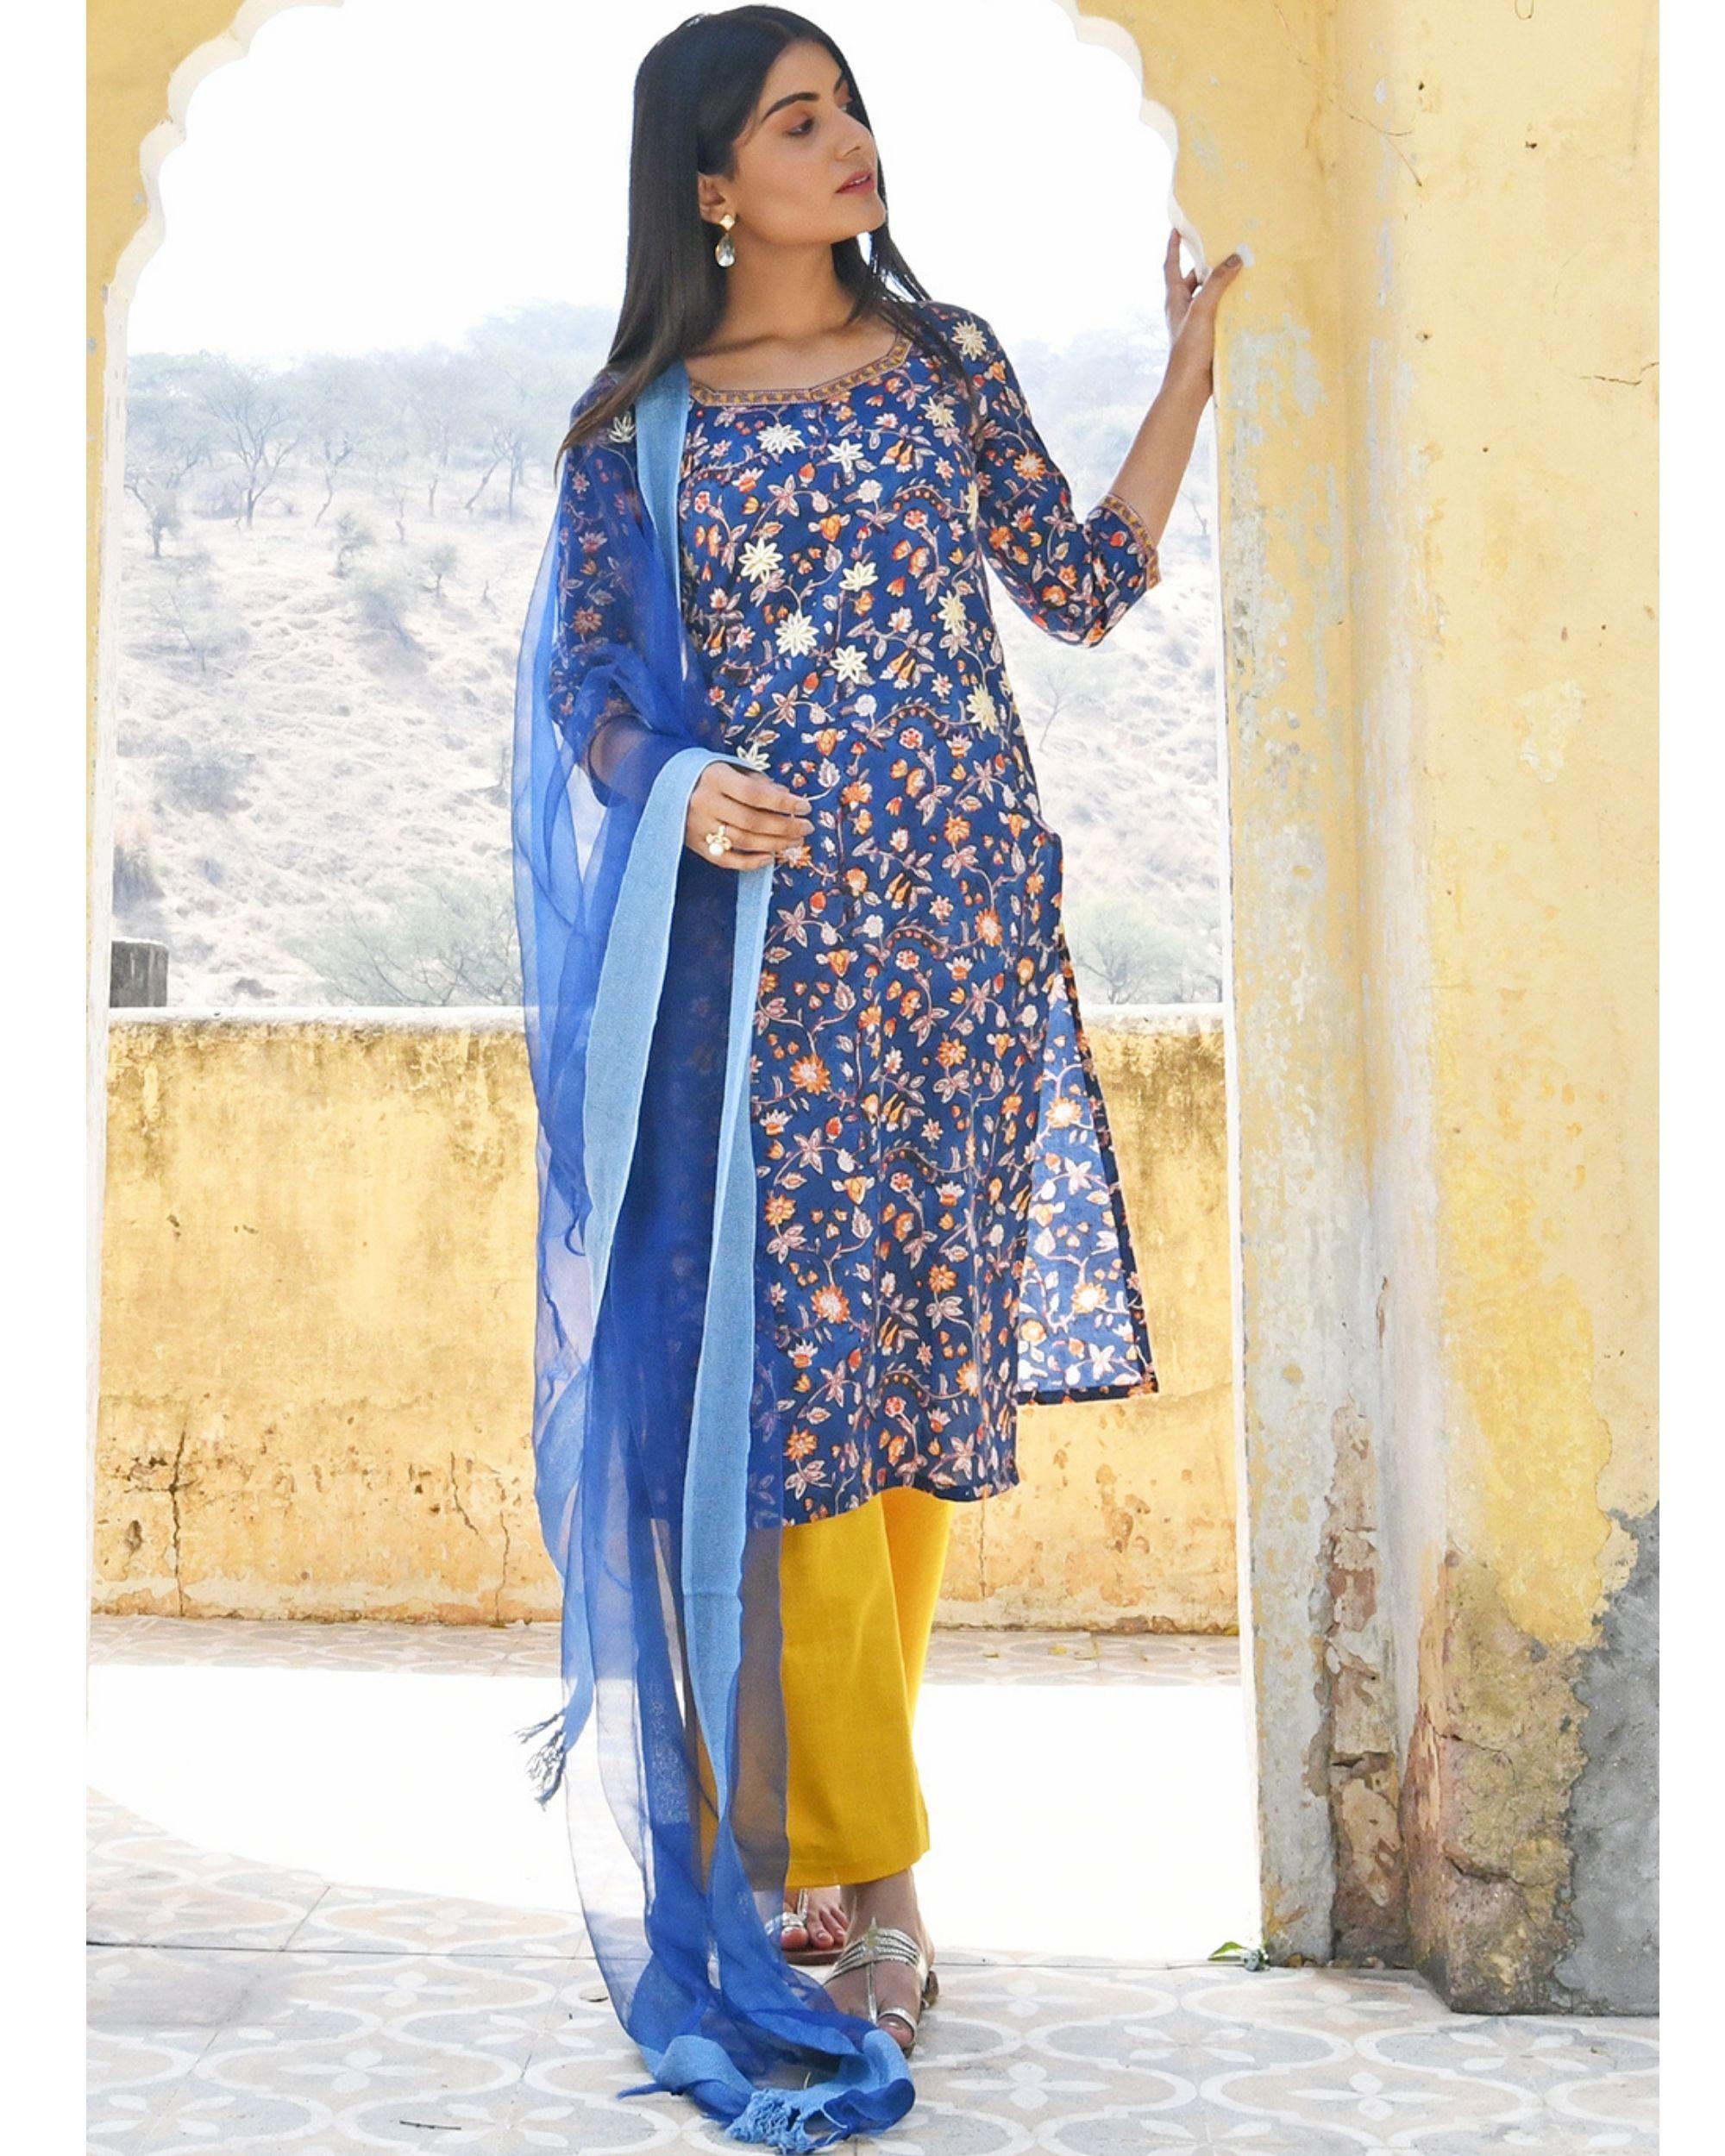 Dark blue floral printed kurta with yellow pants and dupatta - set of three